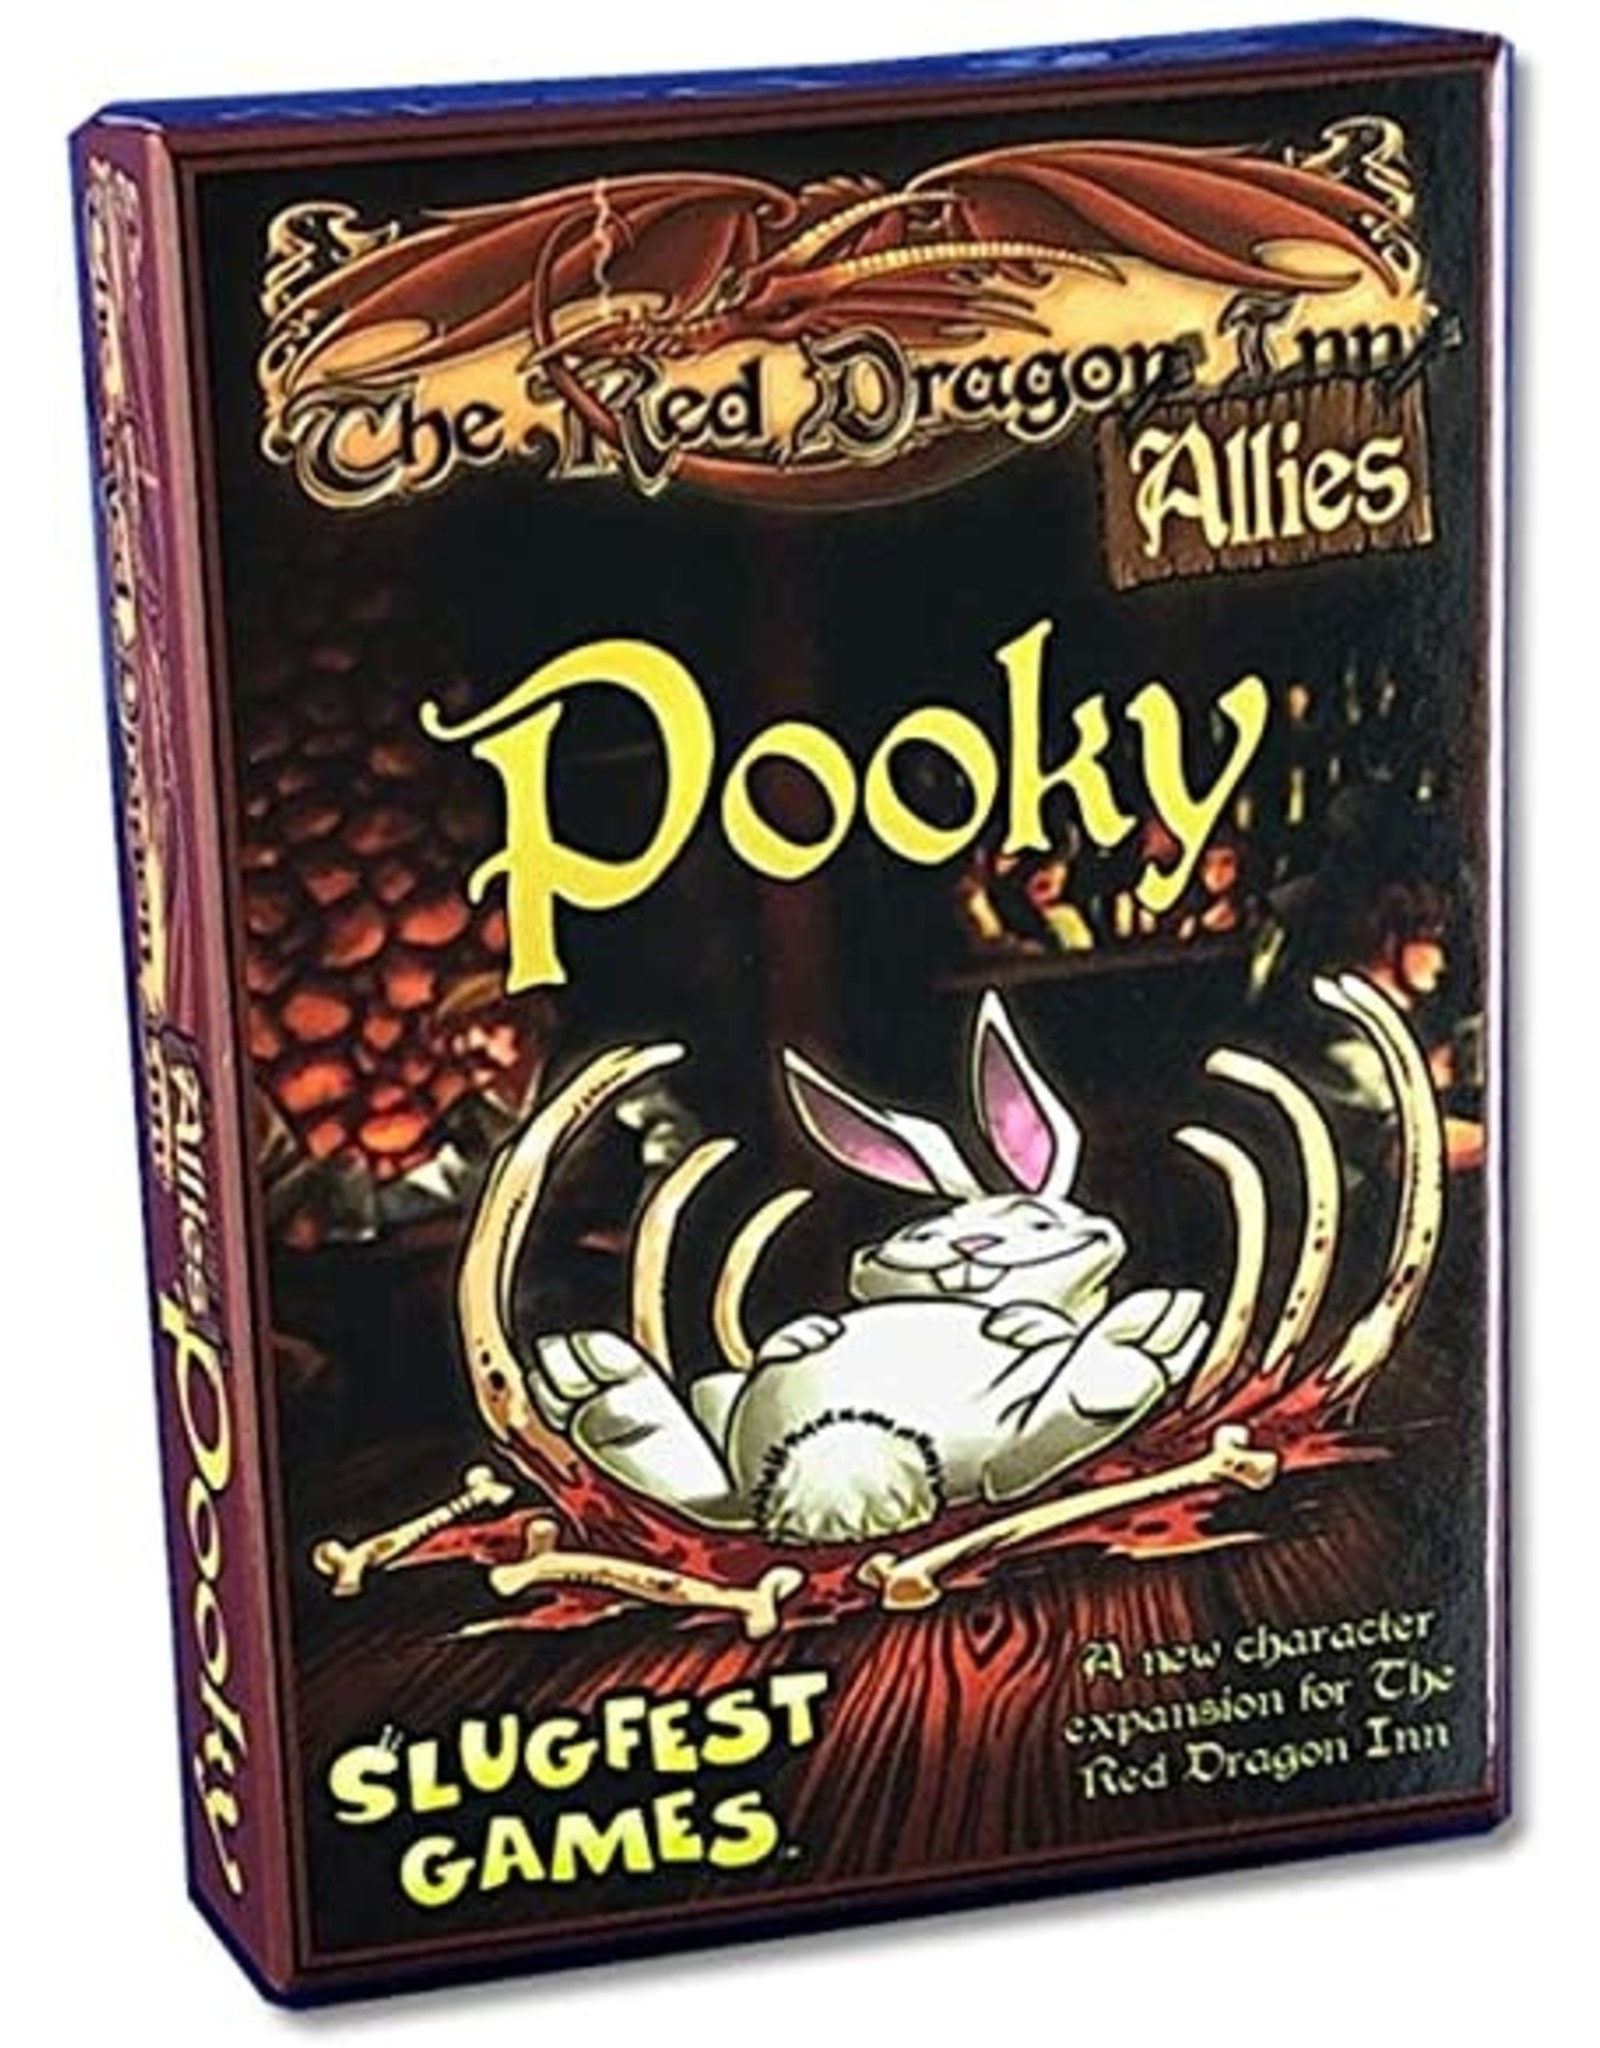 Slugfest Games Red Dragon Inn Allies Pooky